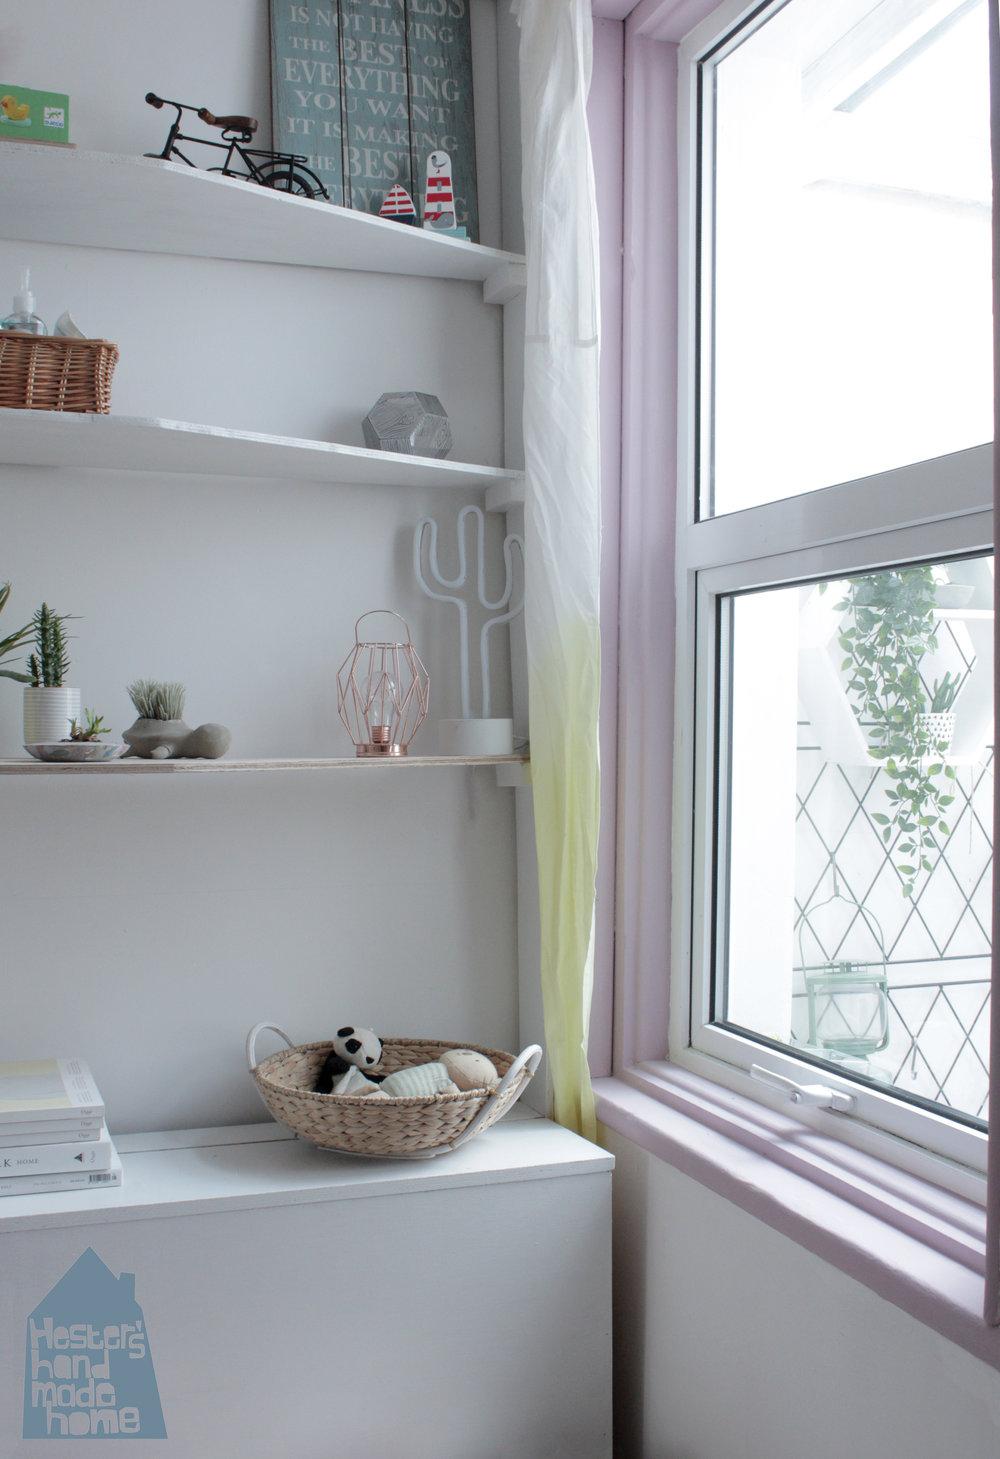 Colour pop window by www.hestershandmadehome.com